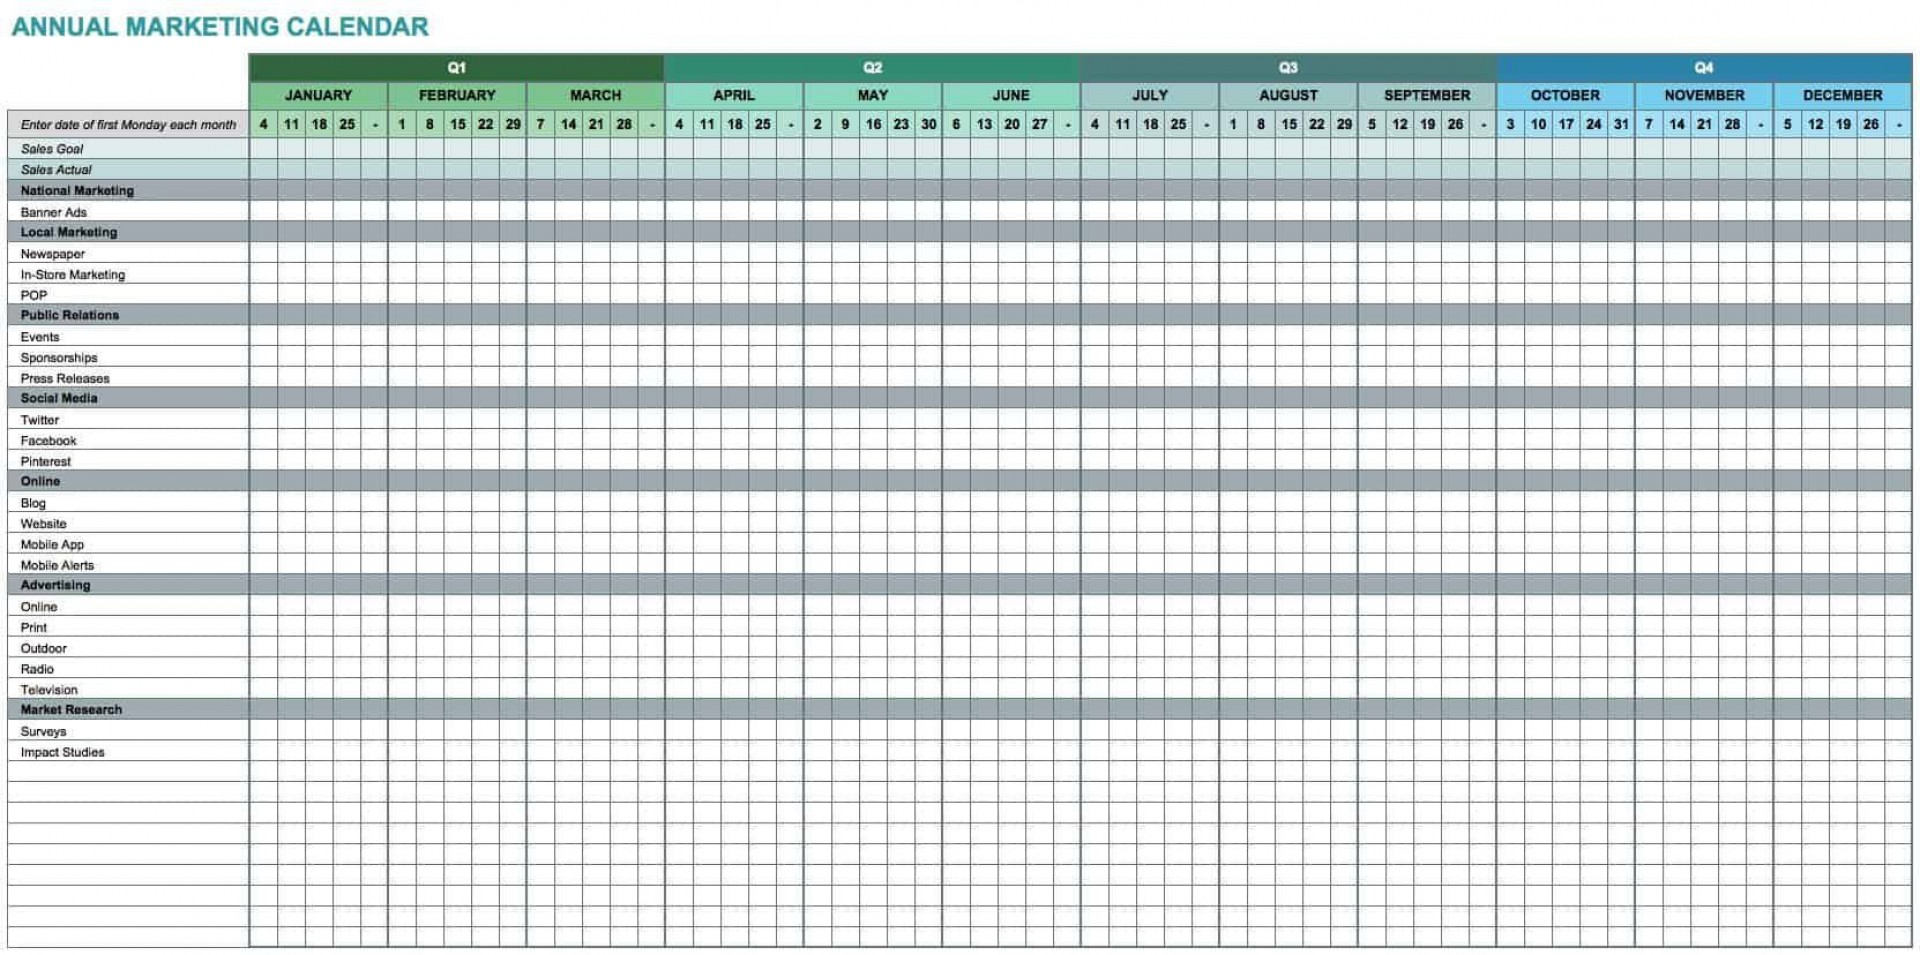 003 Top 52 Week Calendar Template Excel Picture  2020 2019 20211920